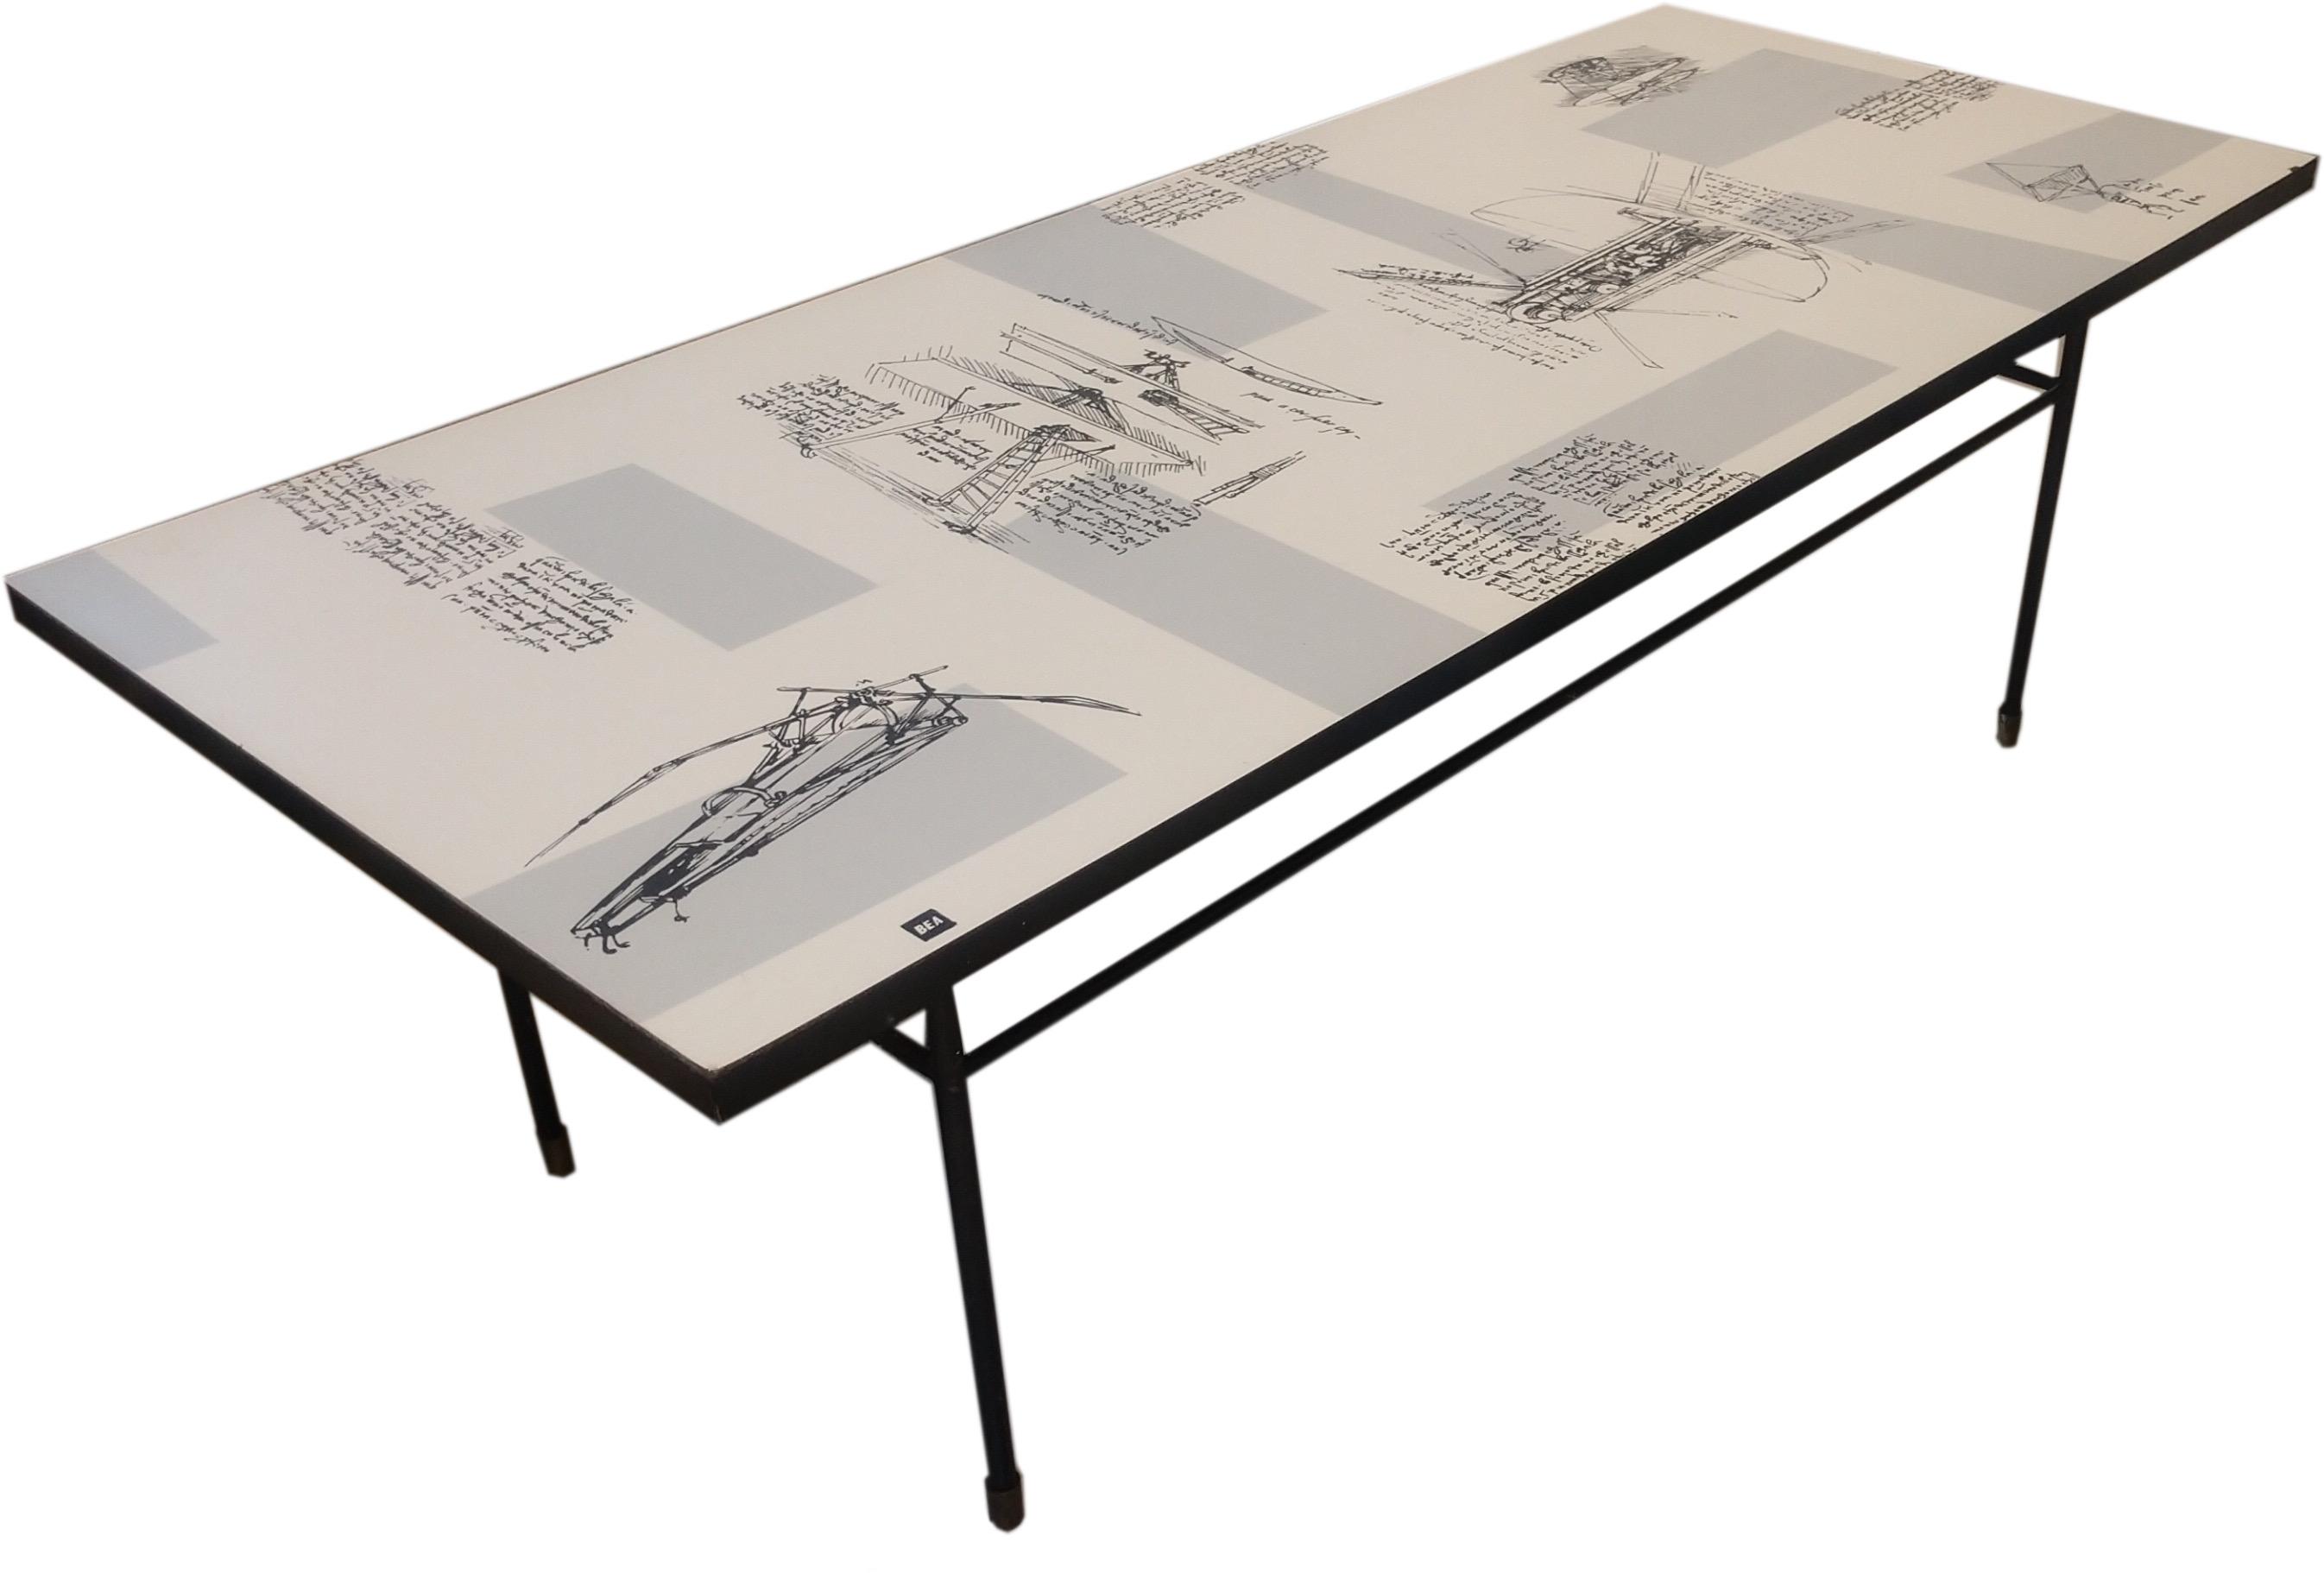 Unique BEA Formica Table